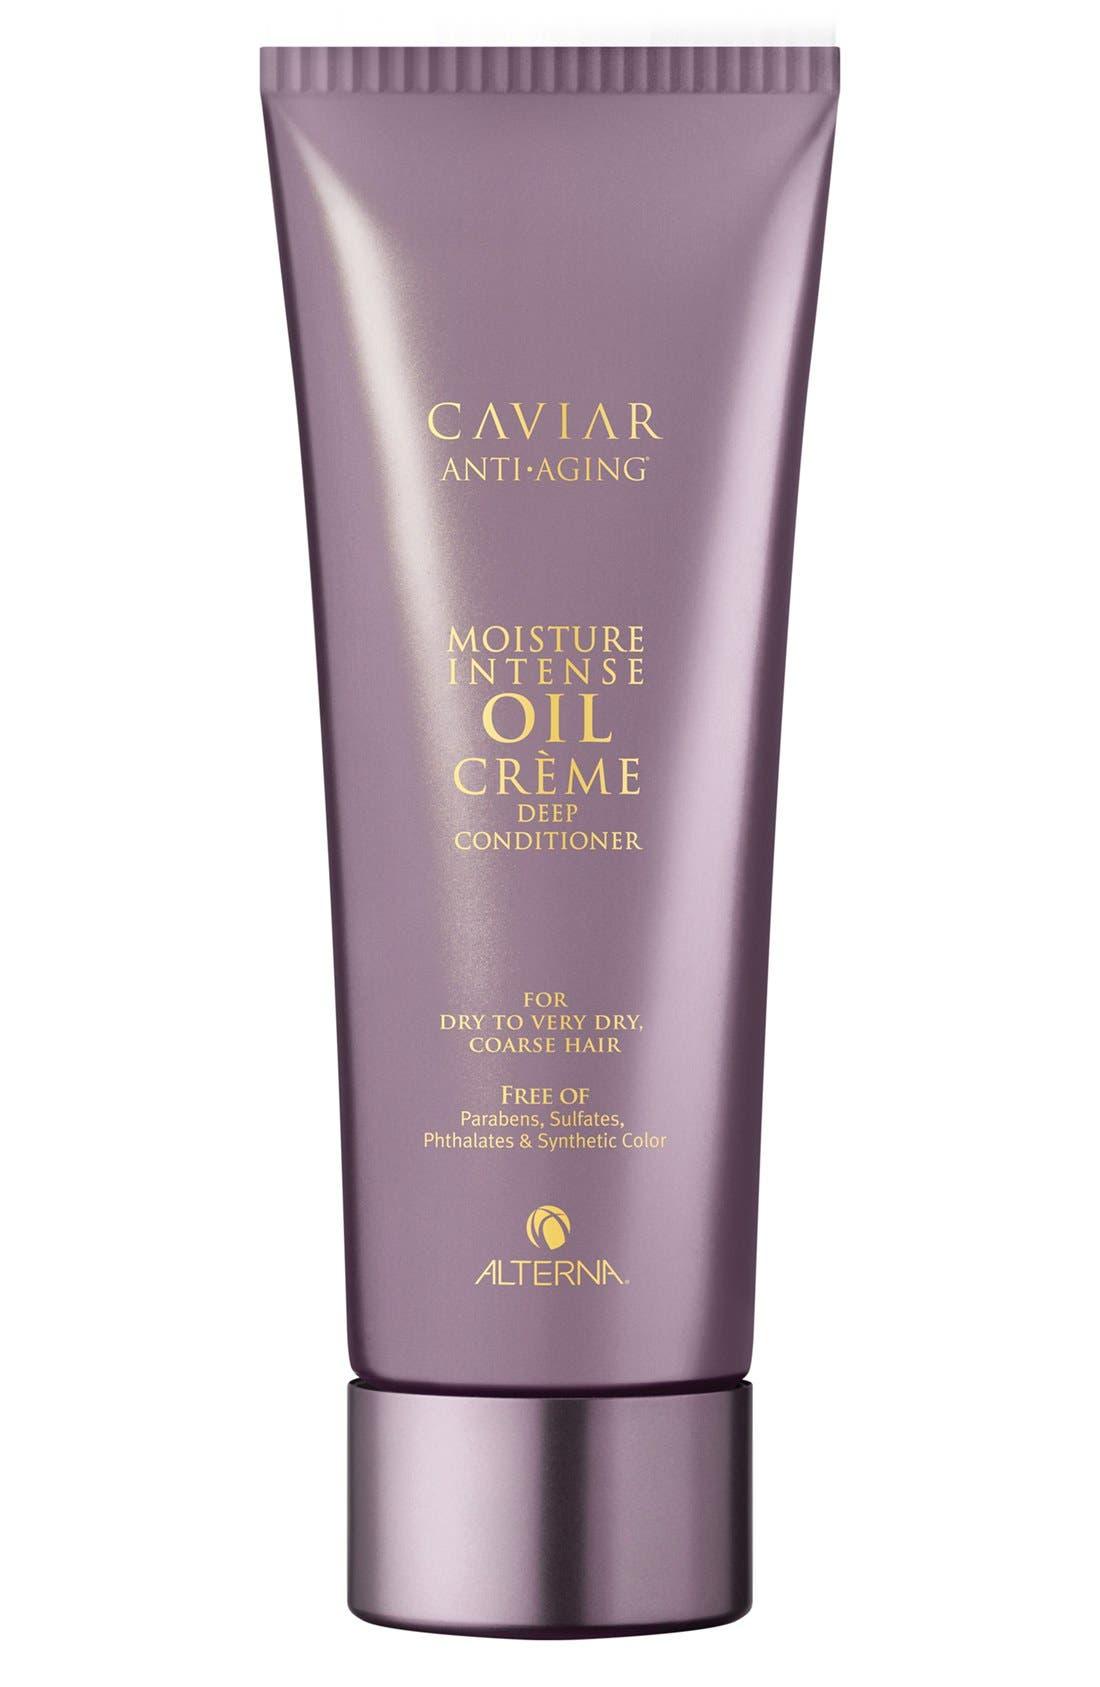 ALTERNA® Caviar Anti-Aging Moisture Intense Oil Creme Deep Conditioner